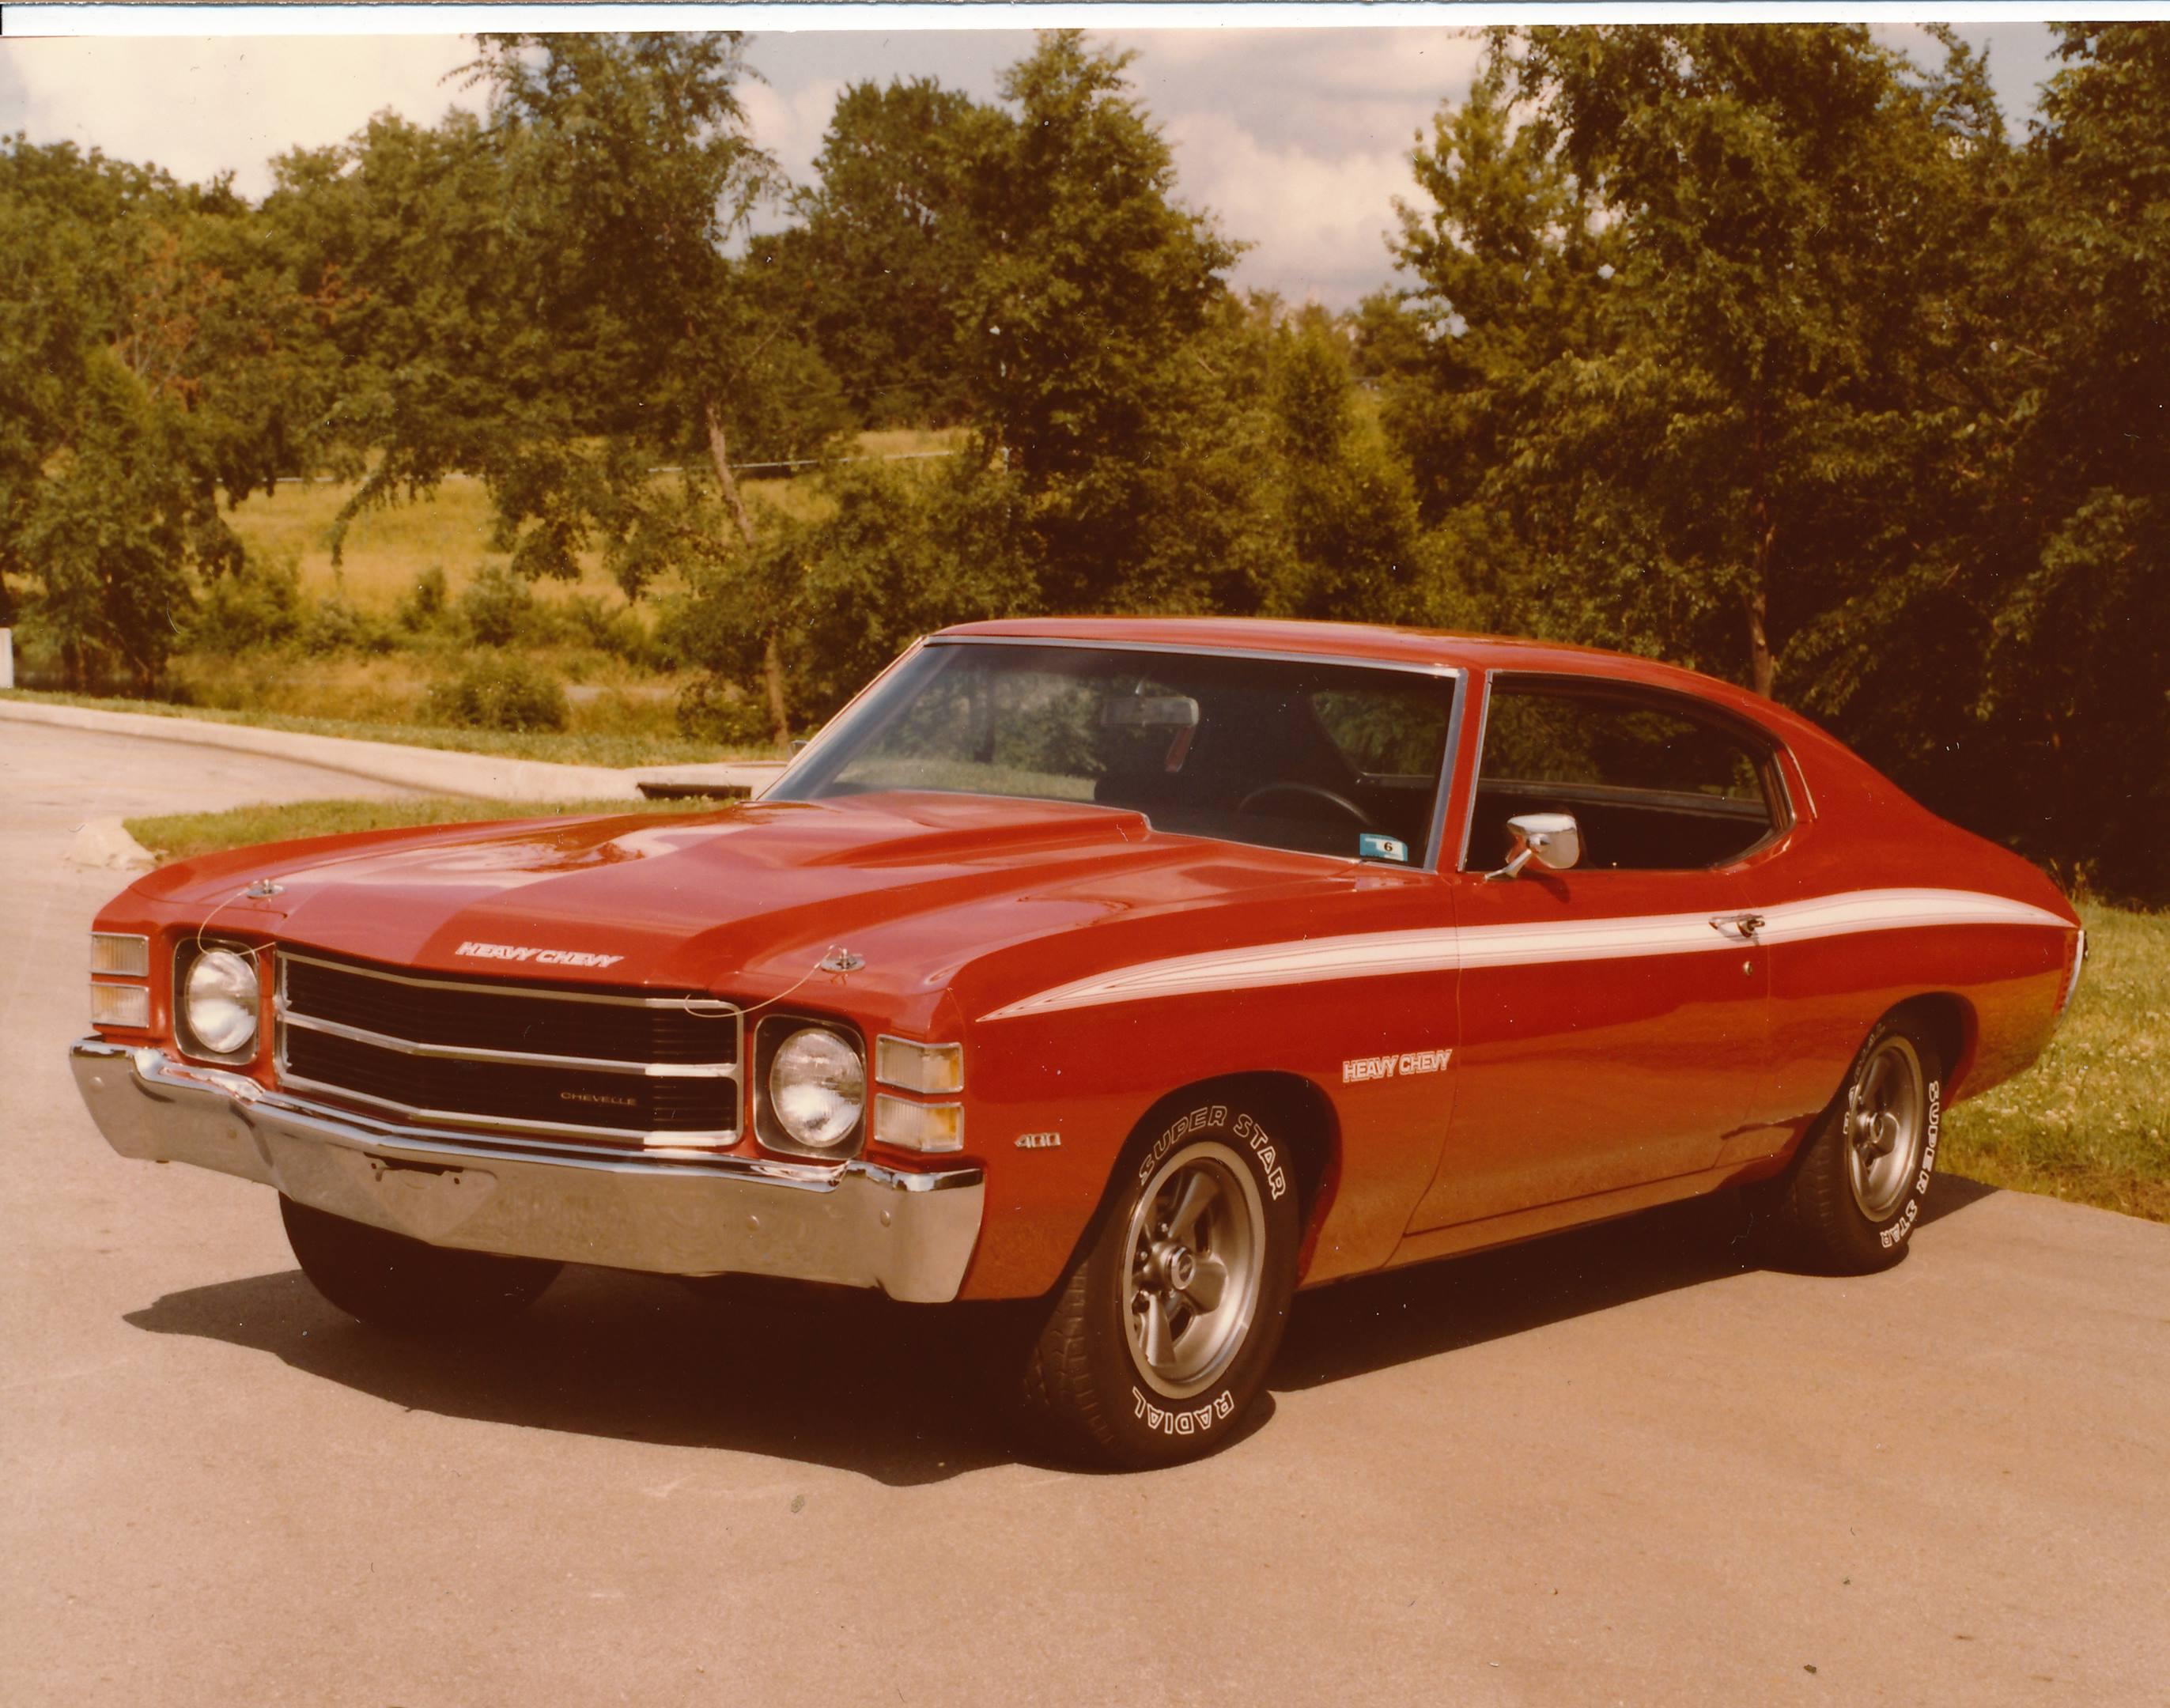 1971 Chevrolet Chevelle Heavy Chevy